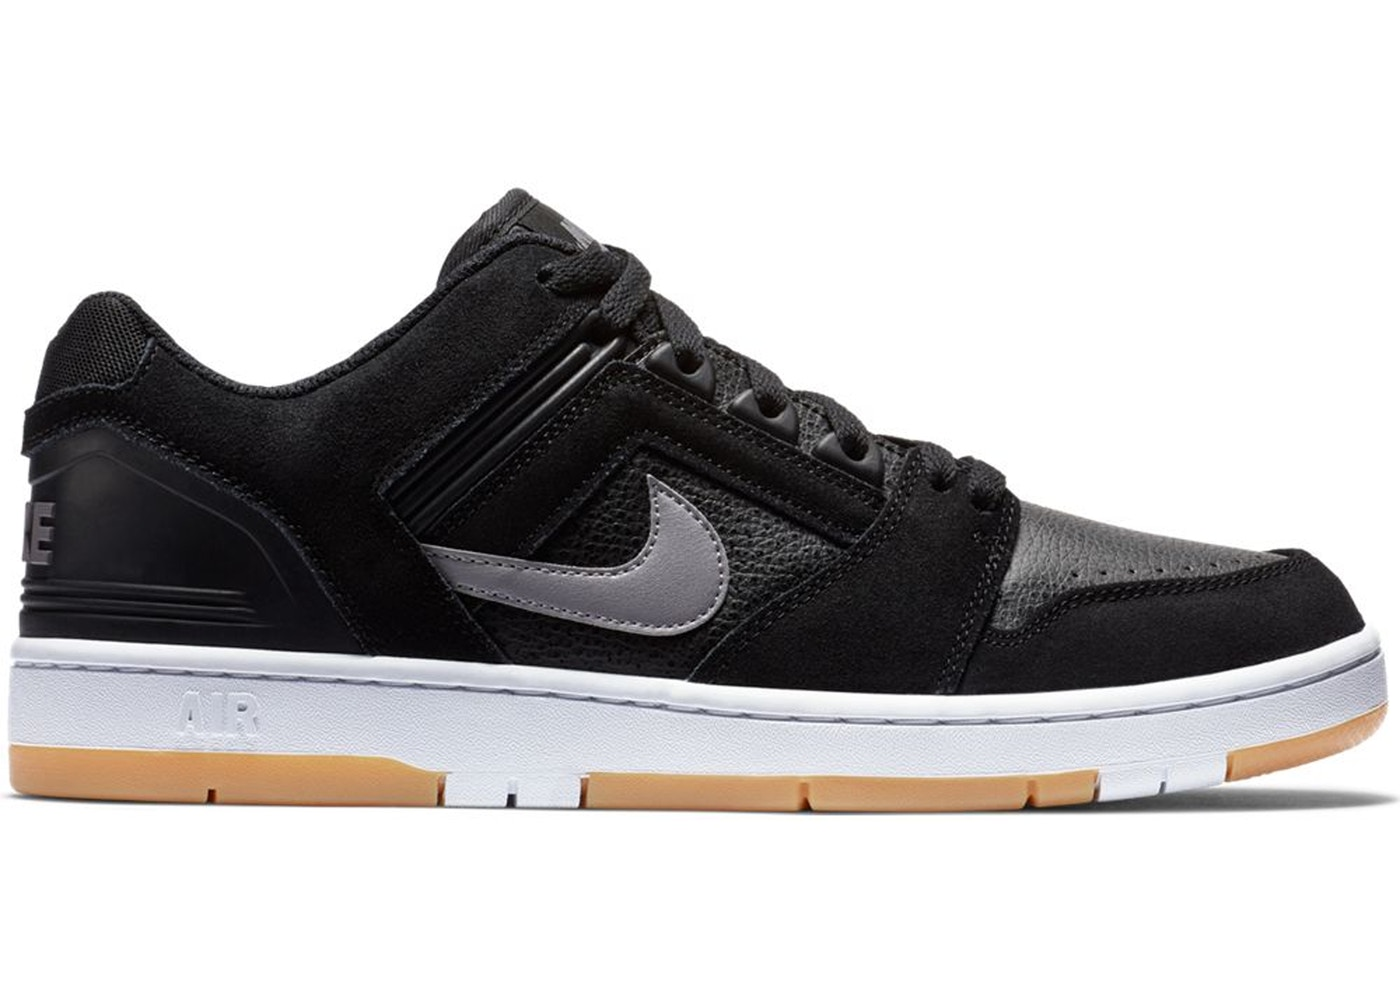 Nike SB Air Force 2 Low Black Grey Gum AO0300 001